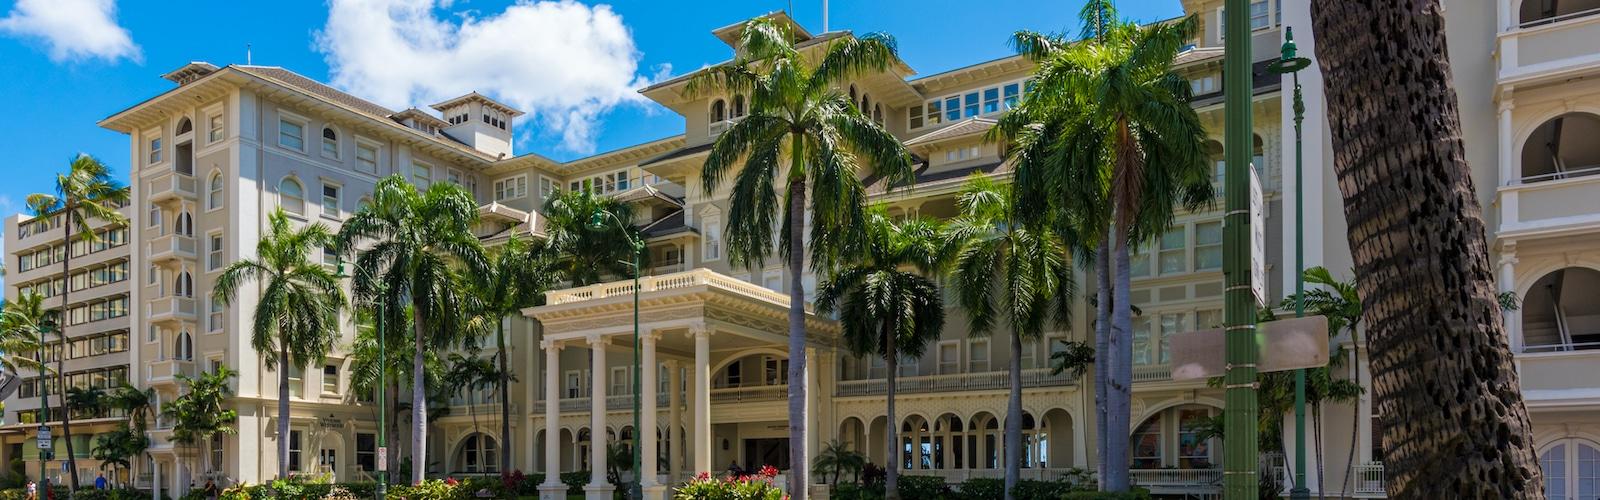 About Oahu, History of Waikiki, Hawaii